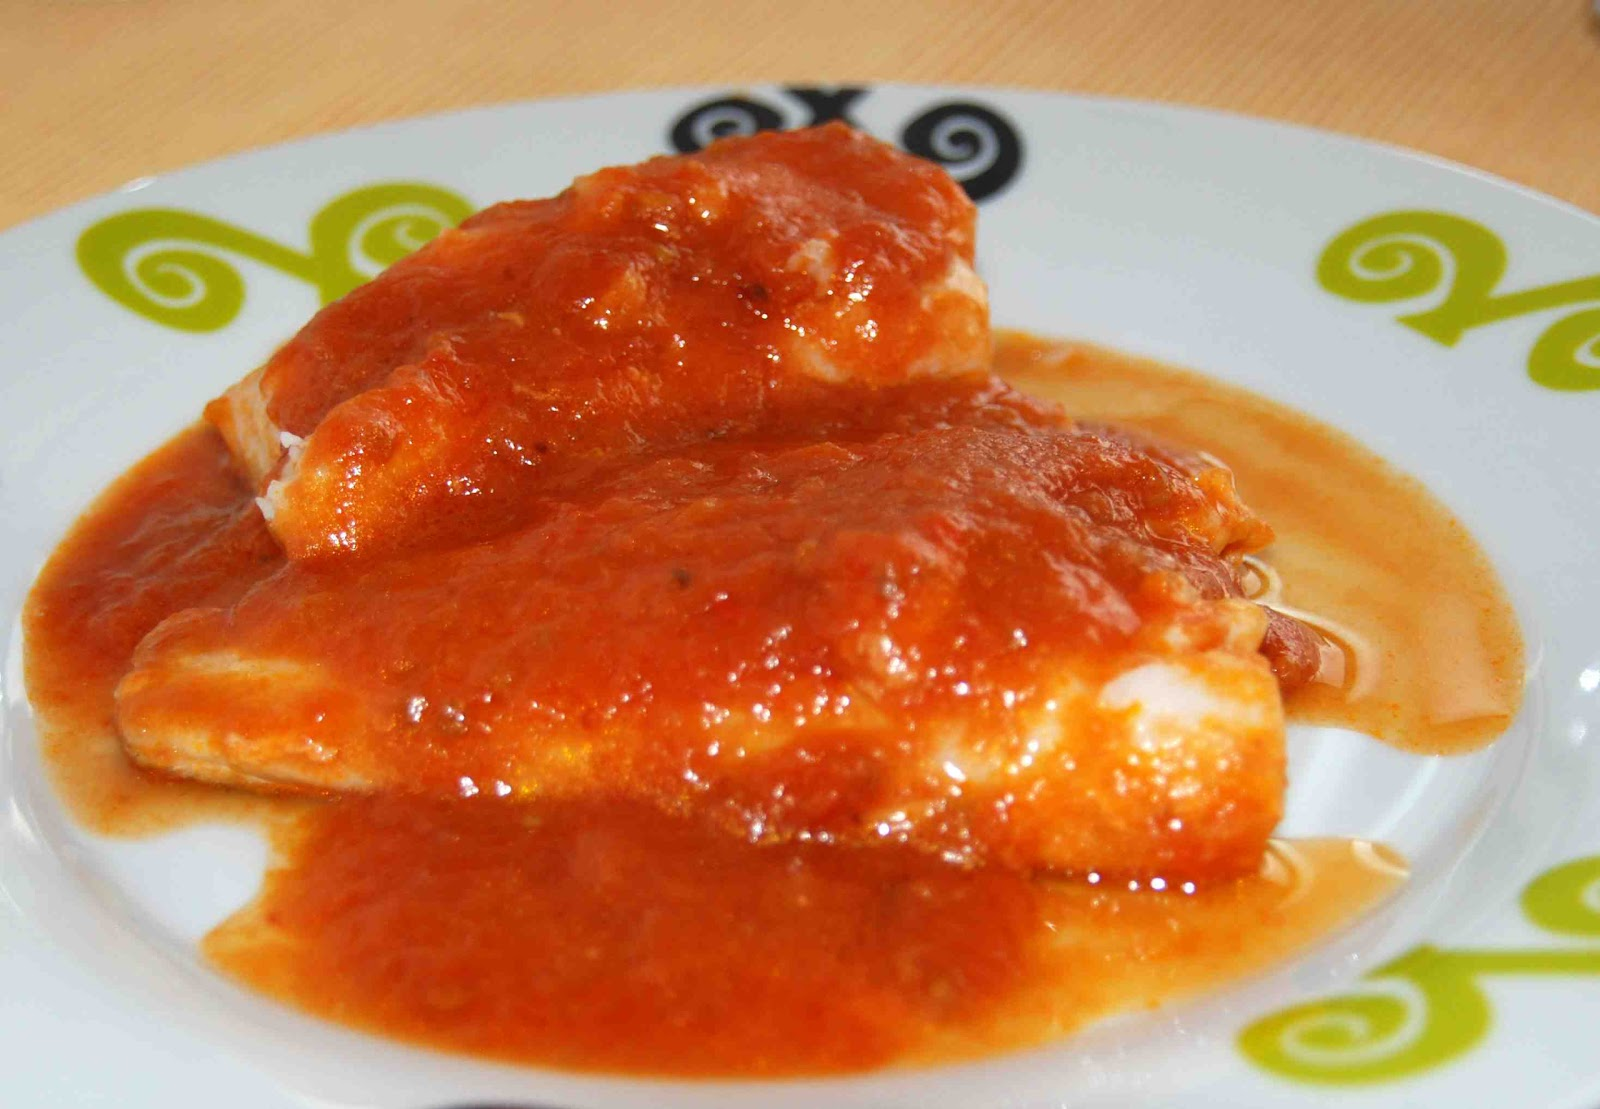 Bacalao con tomate y ensalada de cardo con vinagreta de - Bacalao fresco con tomate ...